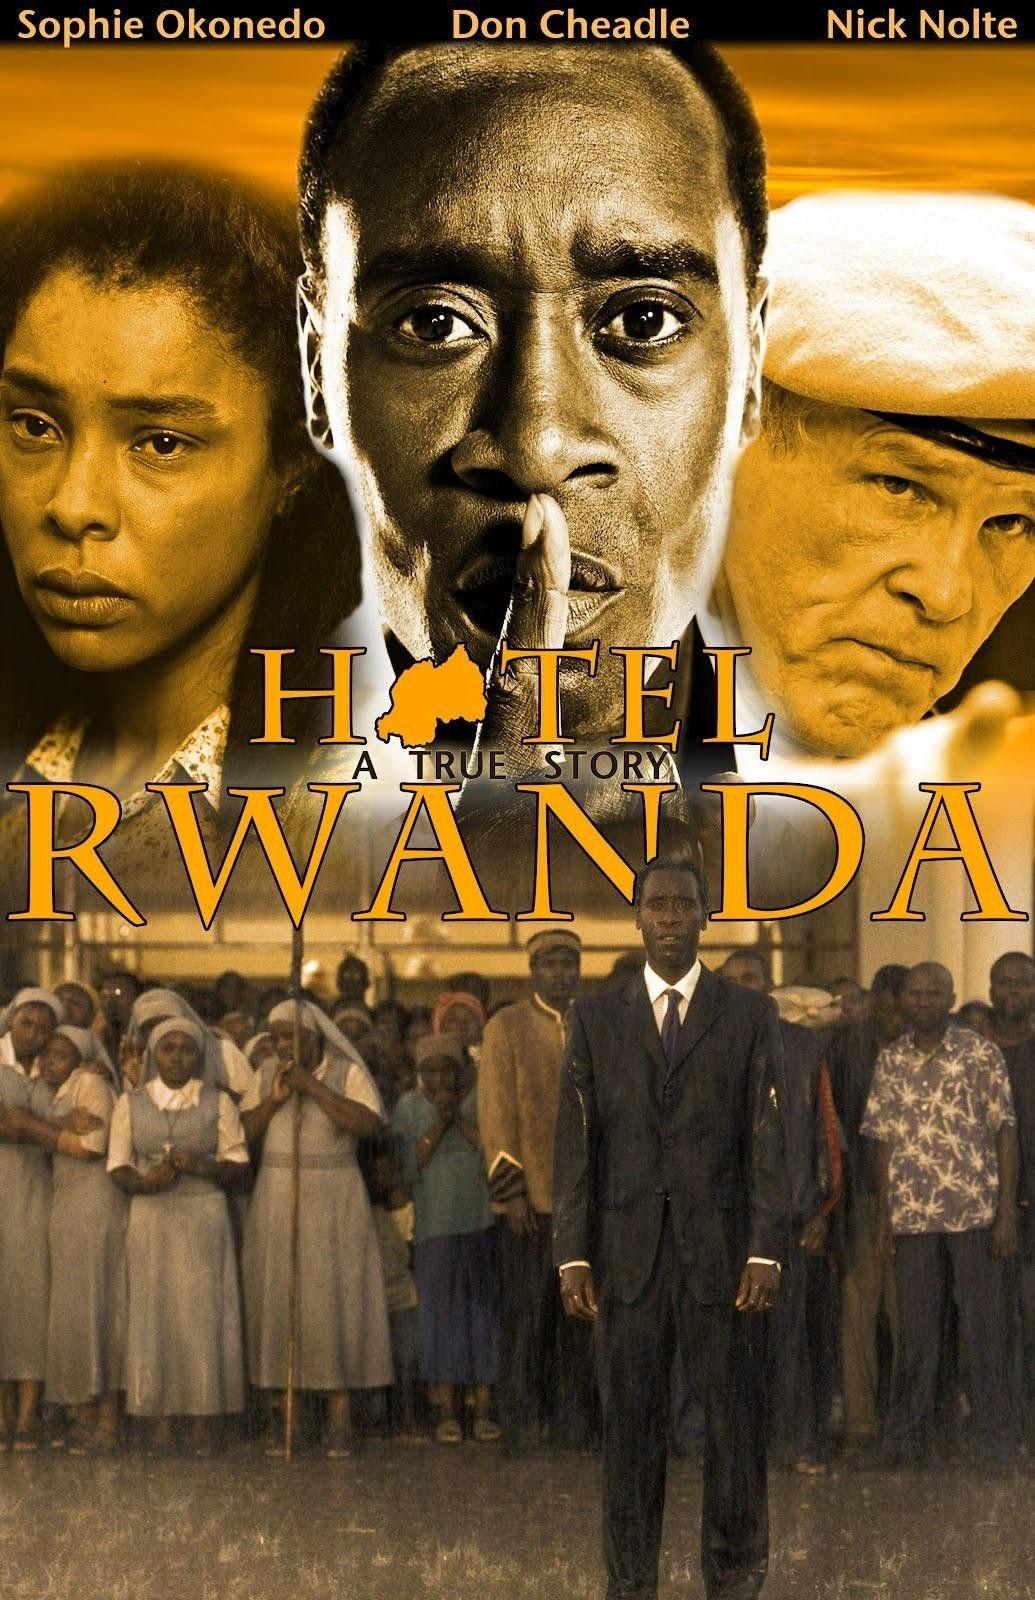 Hotel Rwanda 2005 - Terry George Movies & Moviestars